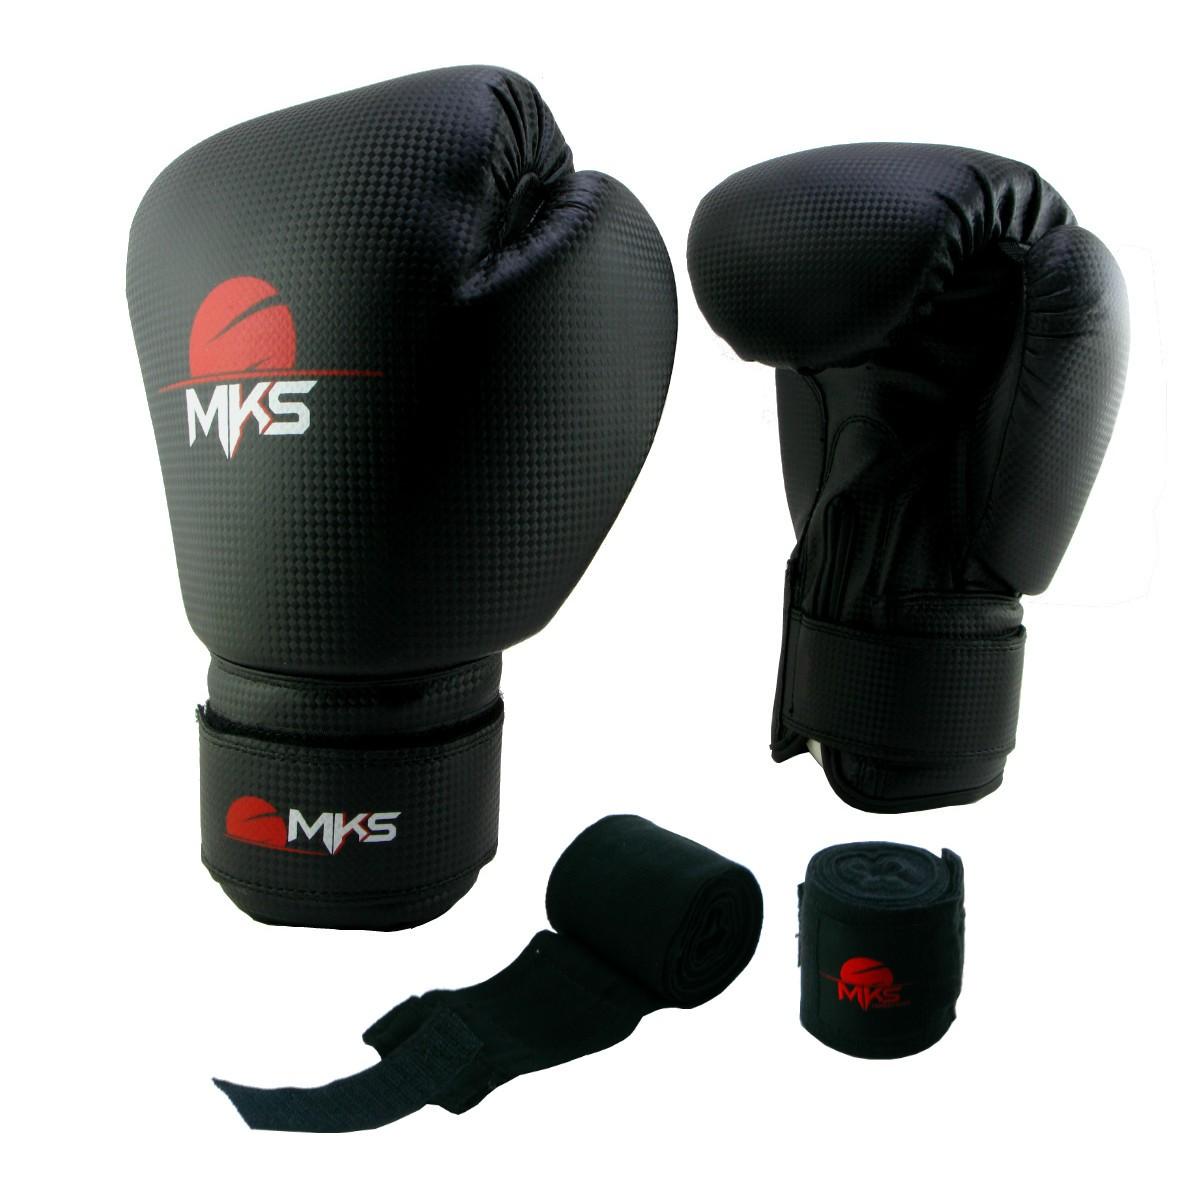 Luva de Boxe Prospect MKS Preta 12 oz + bandagem